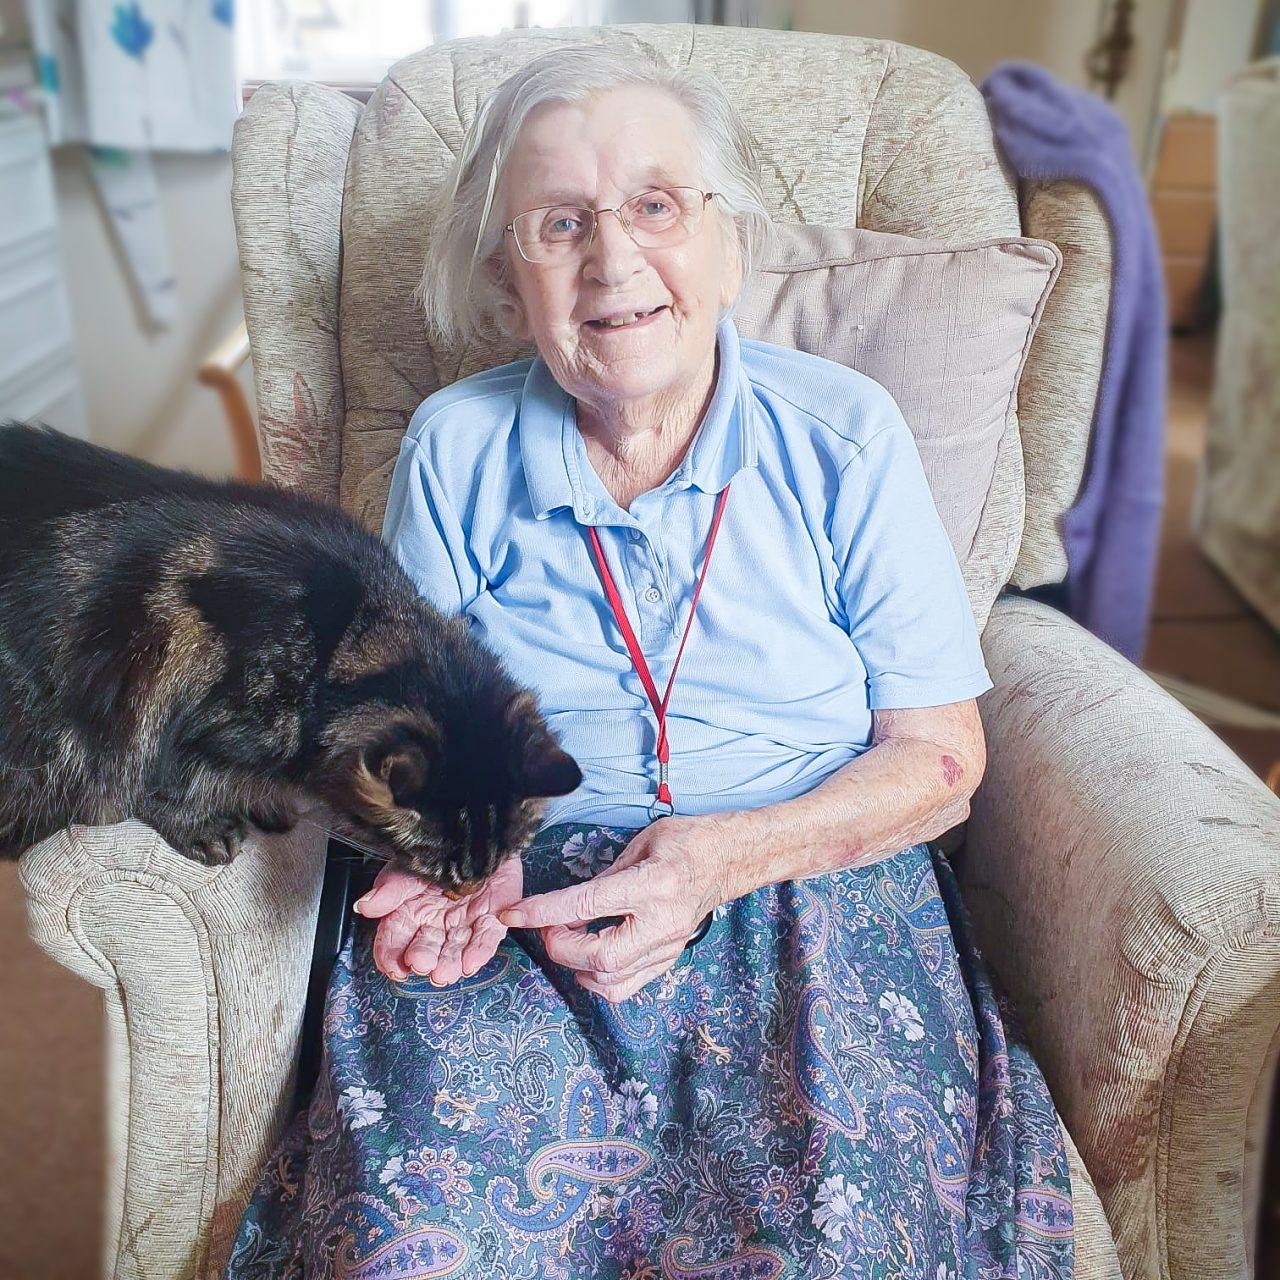 Malvern resident Muriel celebrates her 95th birthday